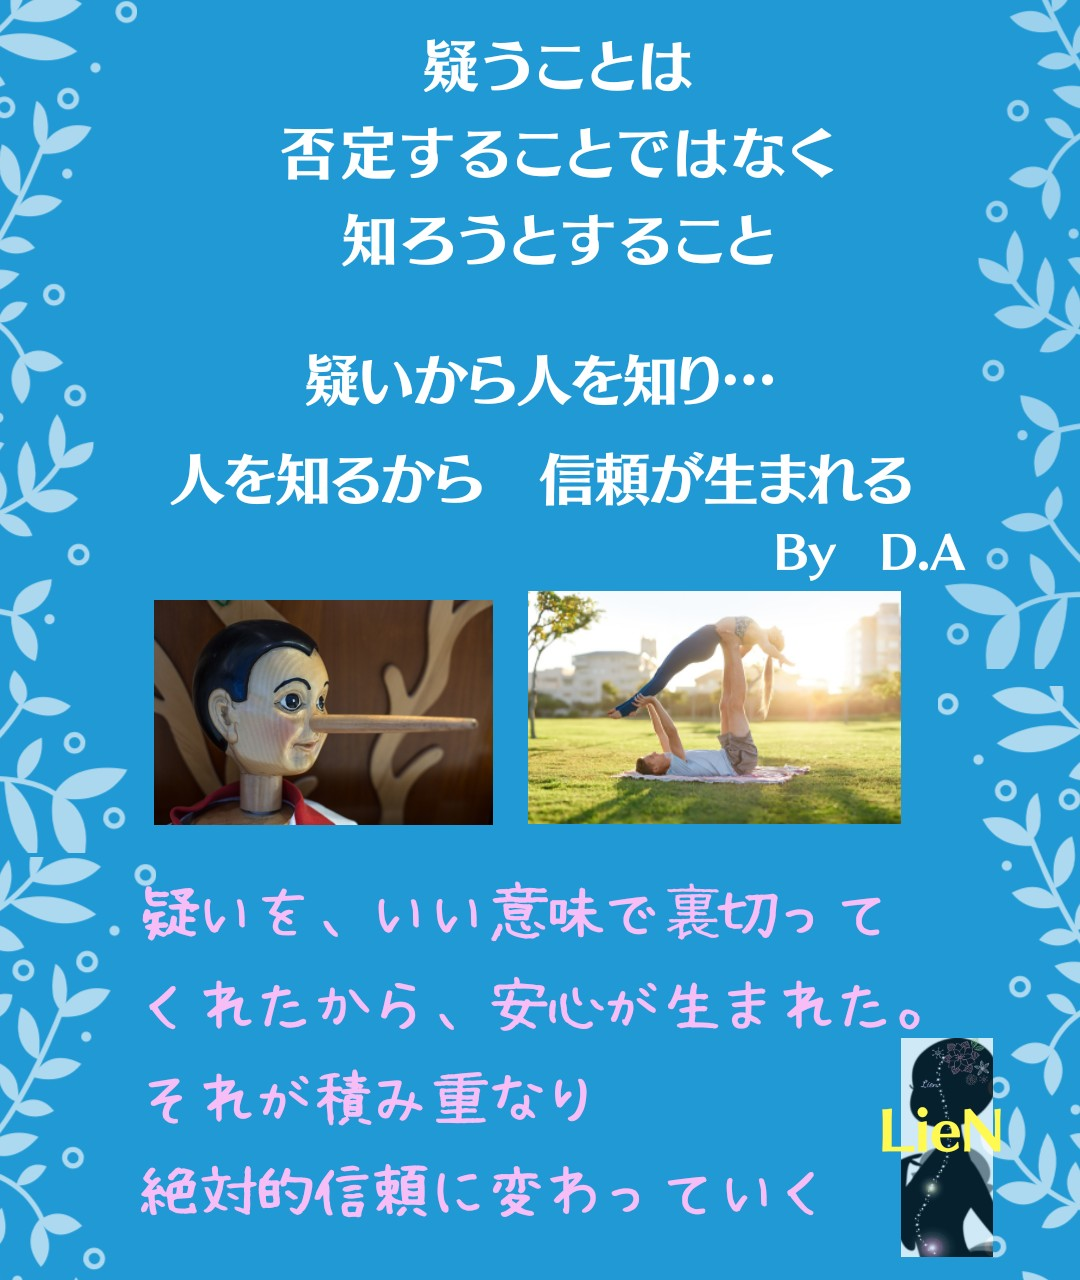 f:id:yuyu-s:20200218034533j:image